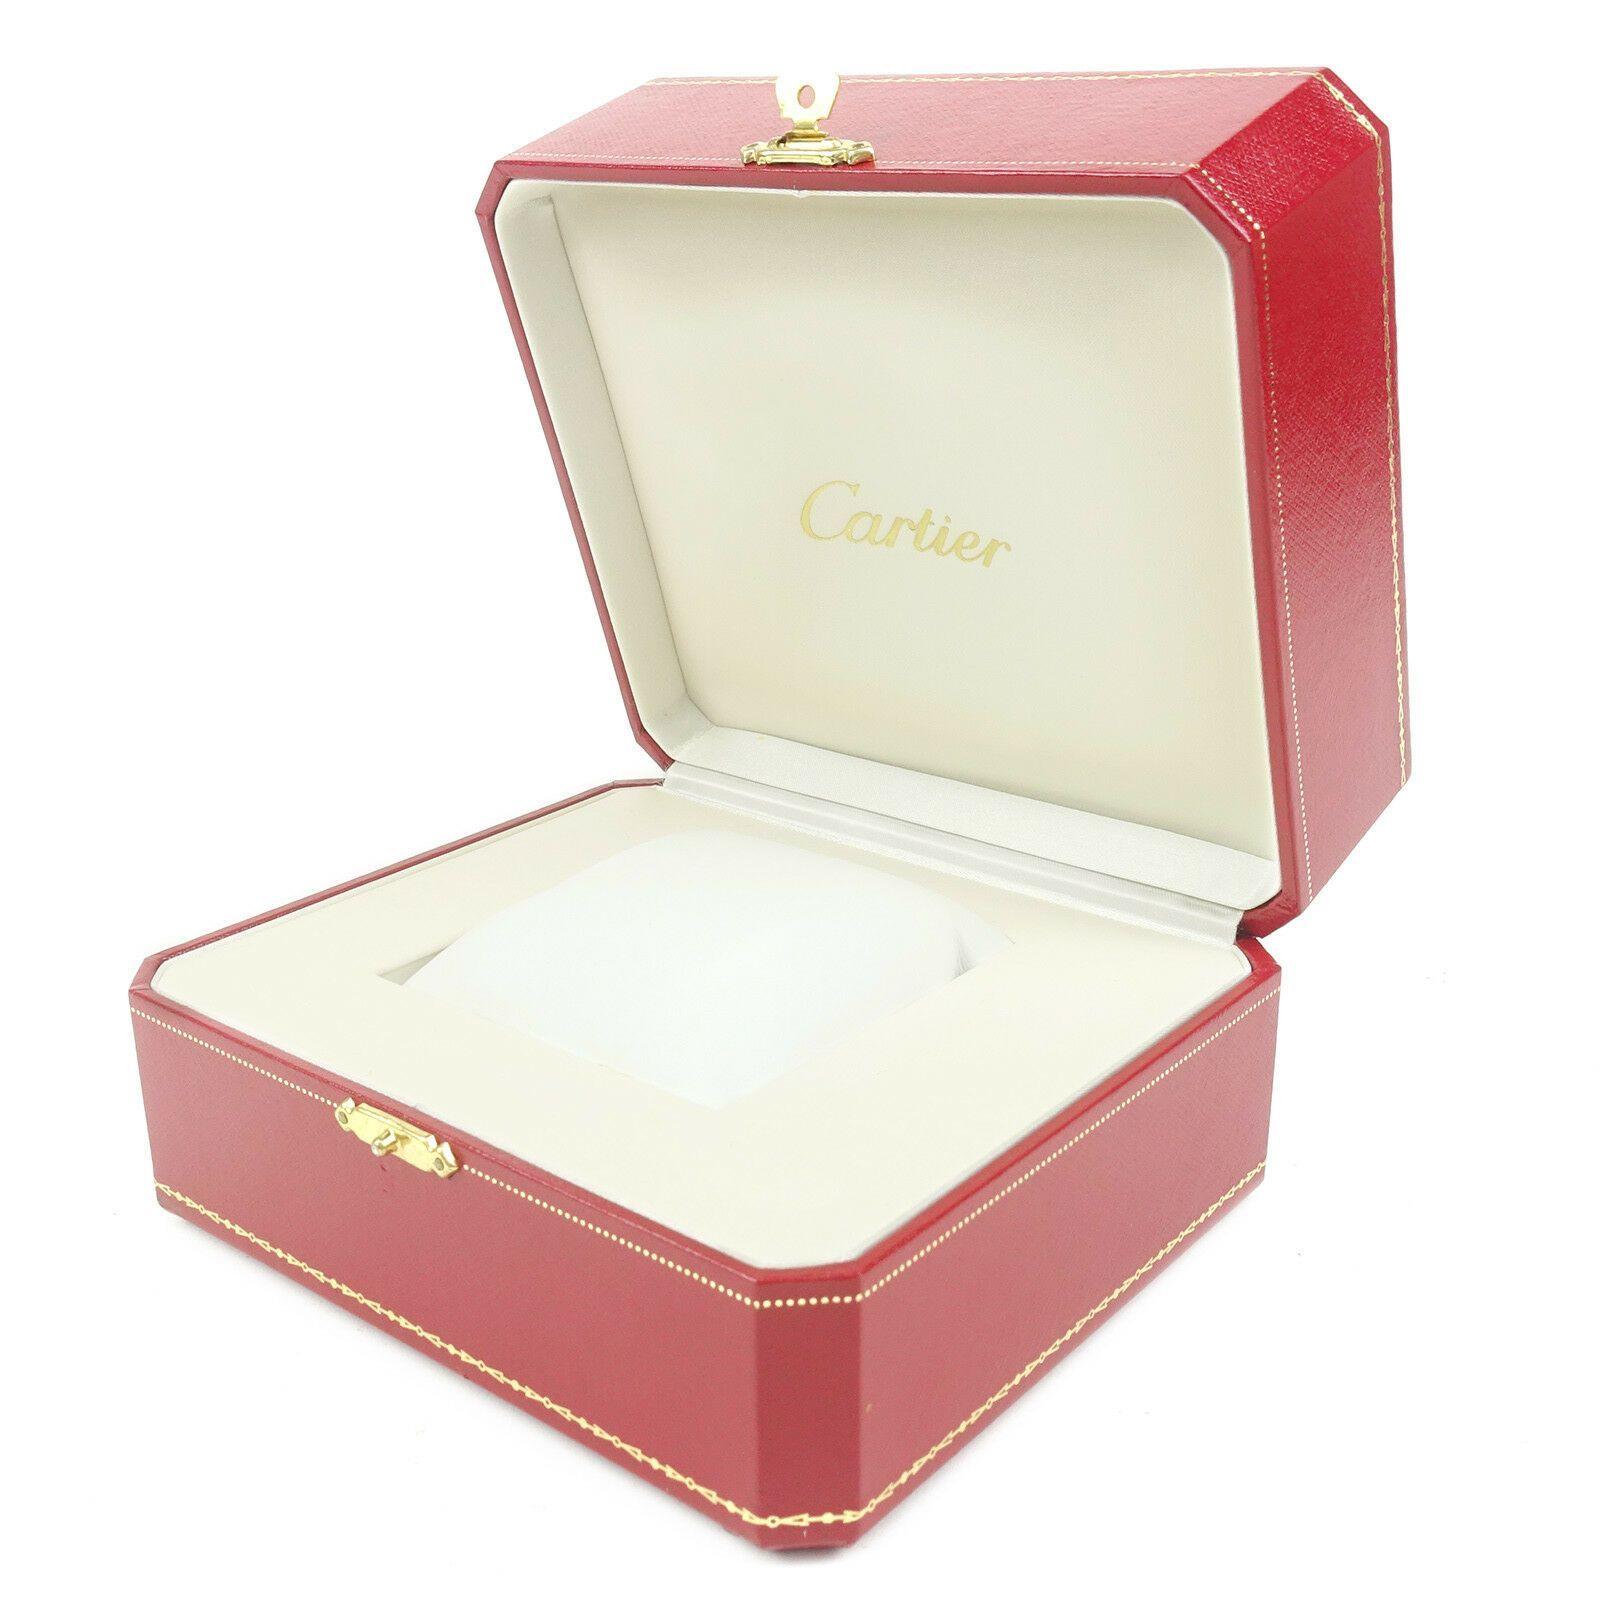 save off 9406d 195f2 Cartier BOX CASE Wrist Watch Box Dispaly Box COWA0043 #7 ...